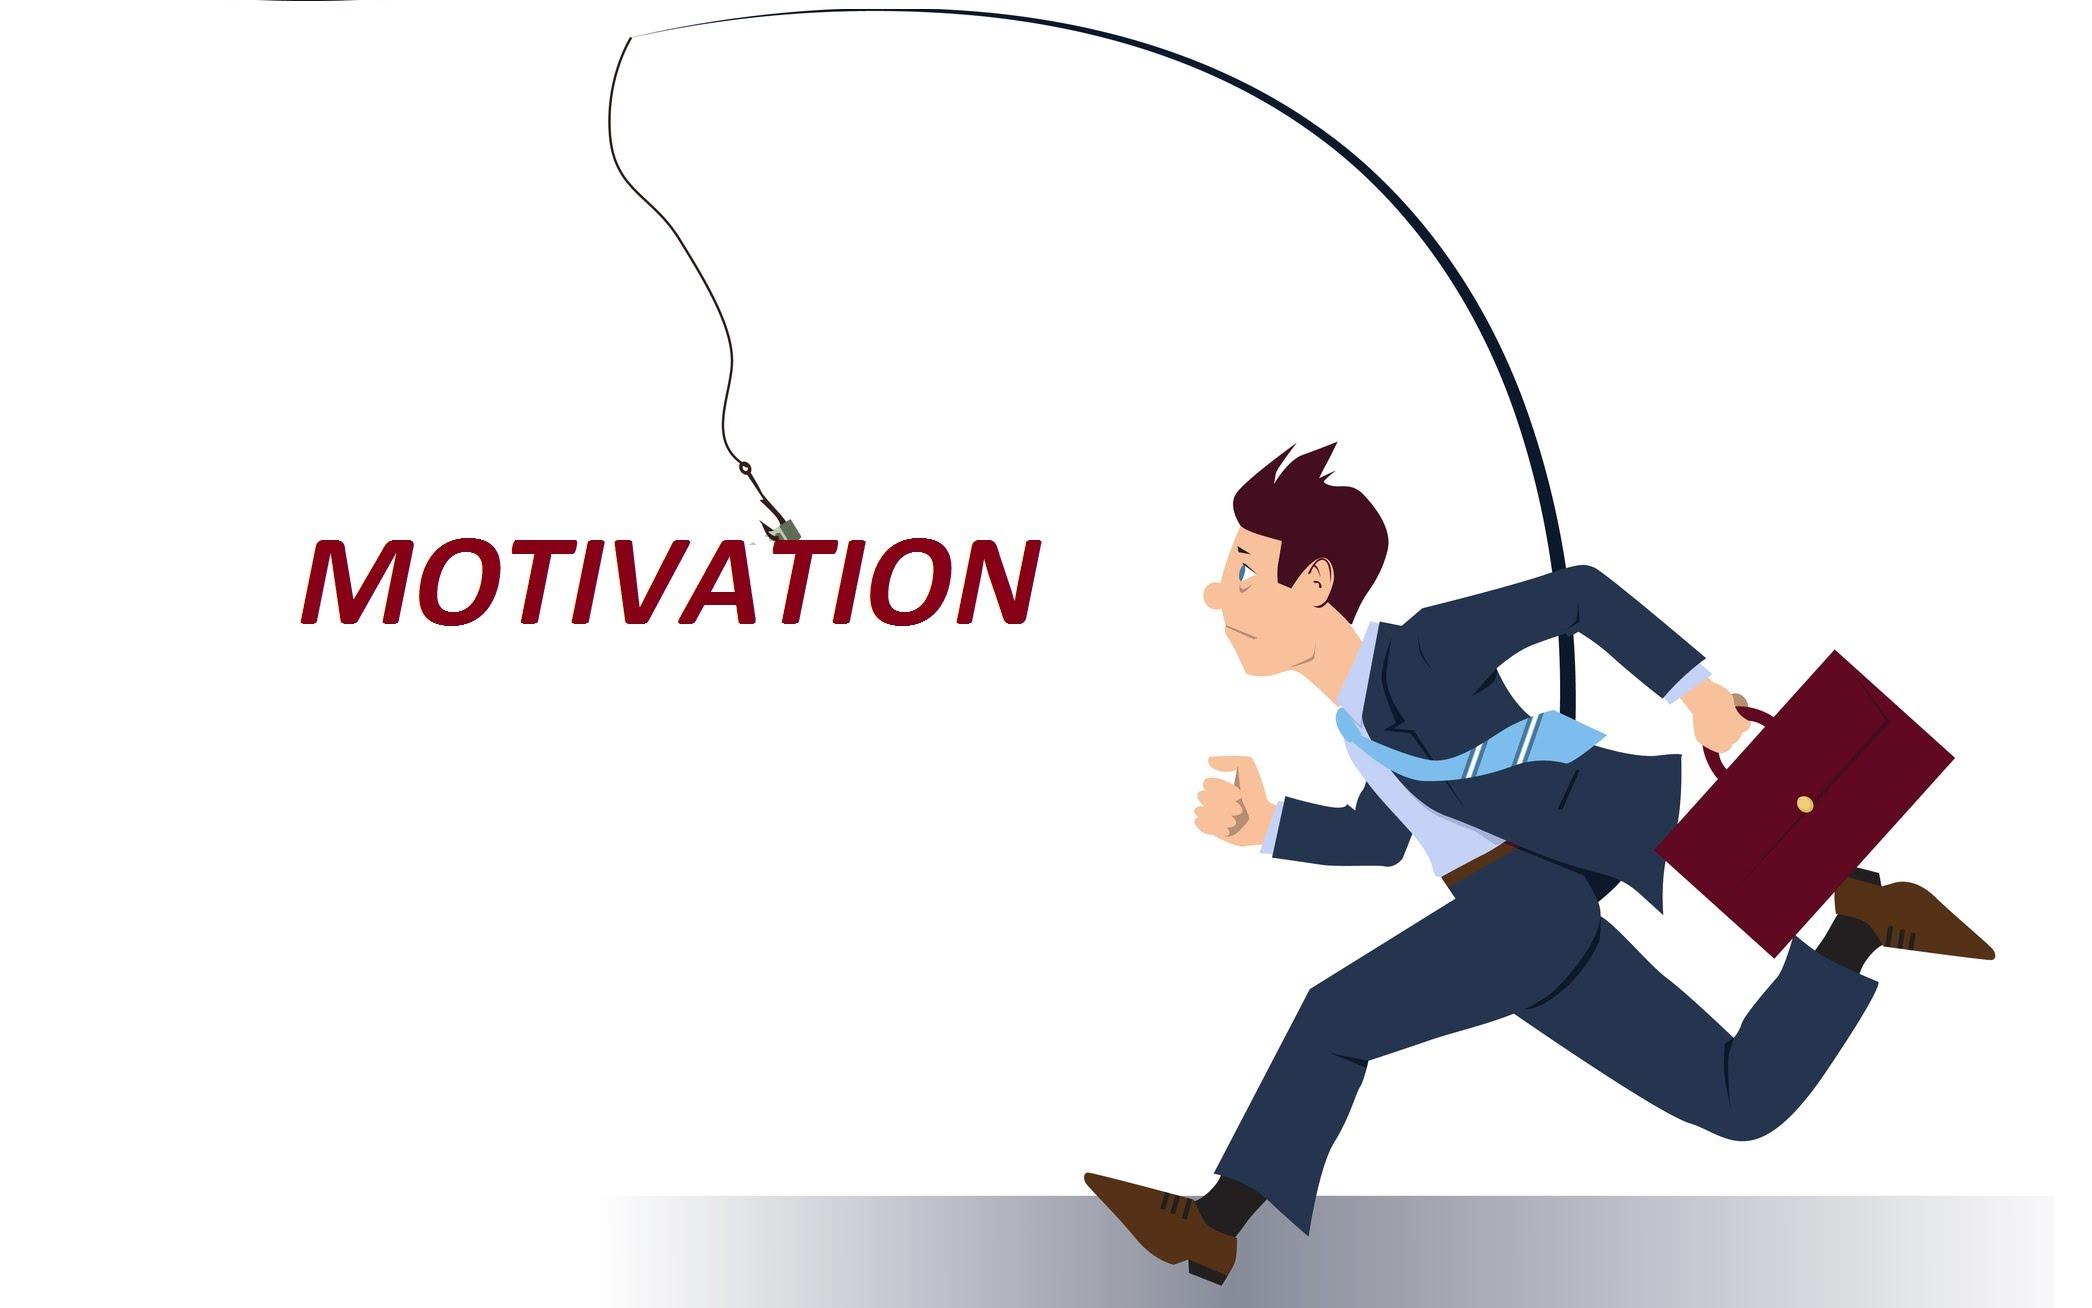 День, картинка для сотрудников мотивация